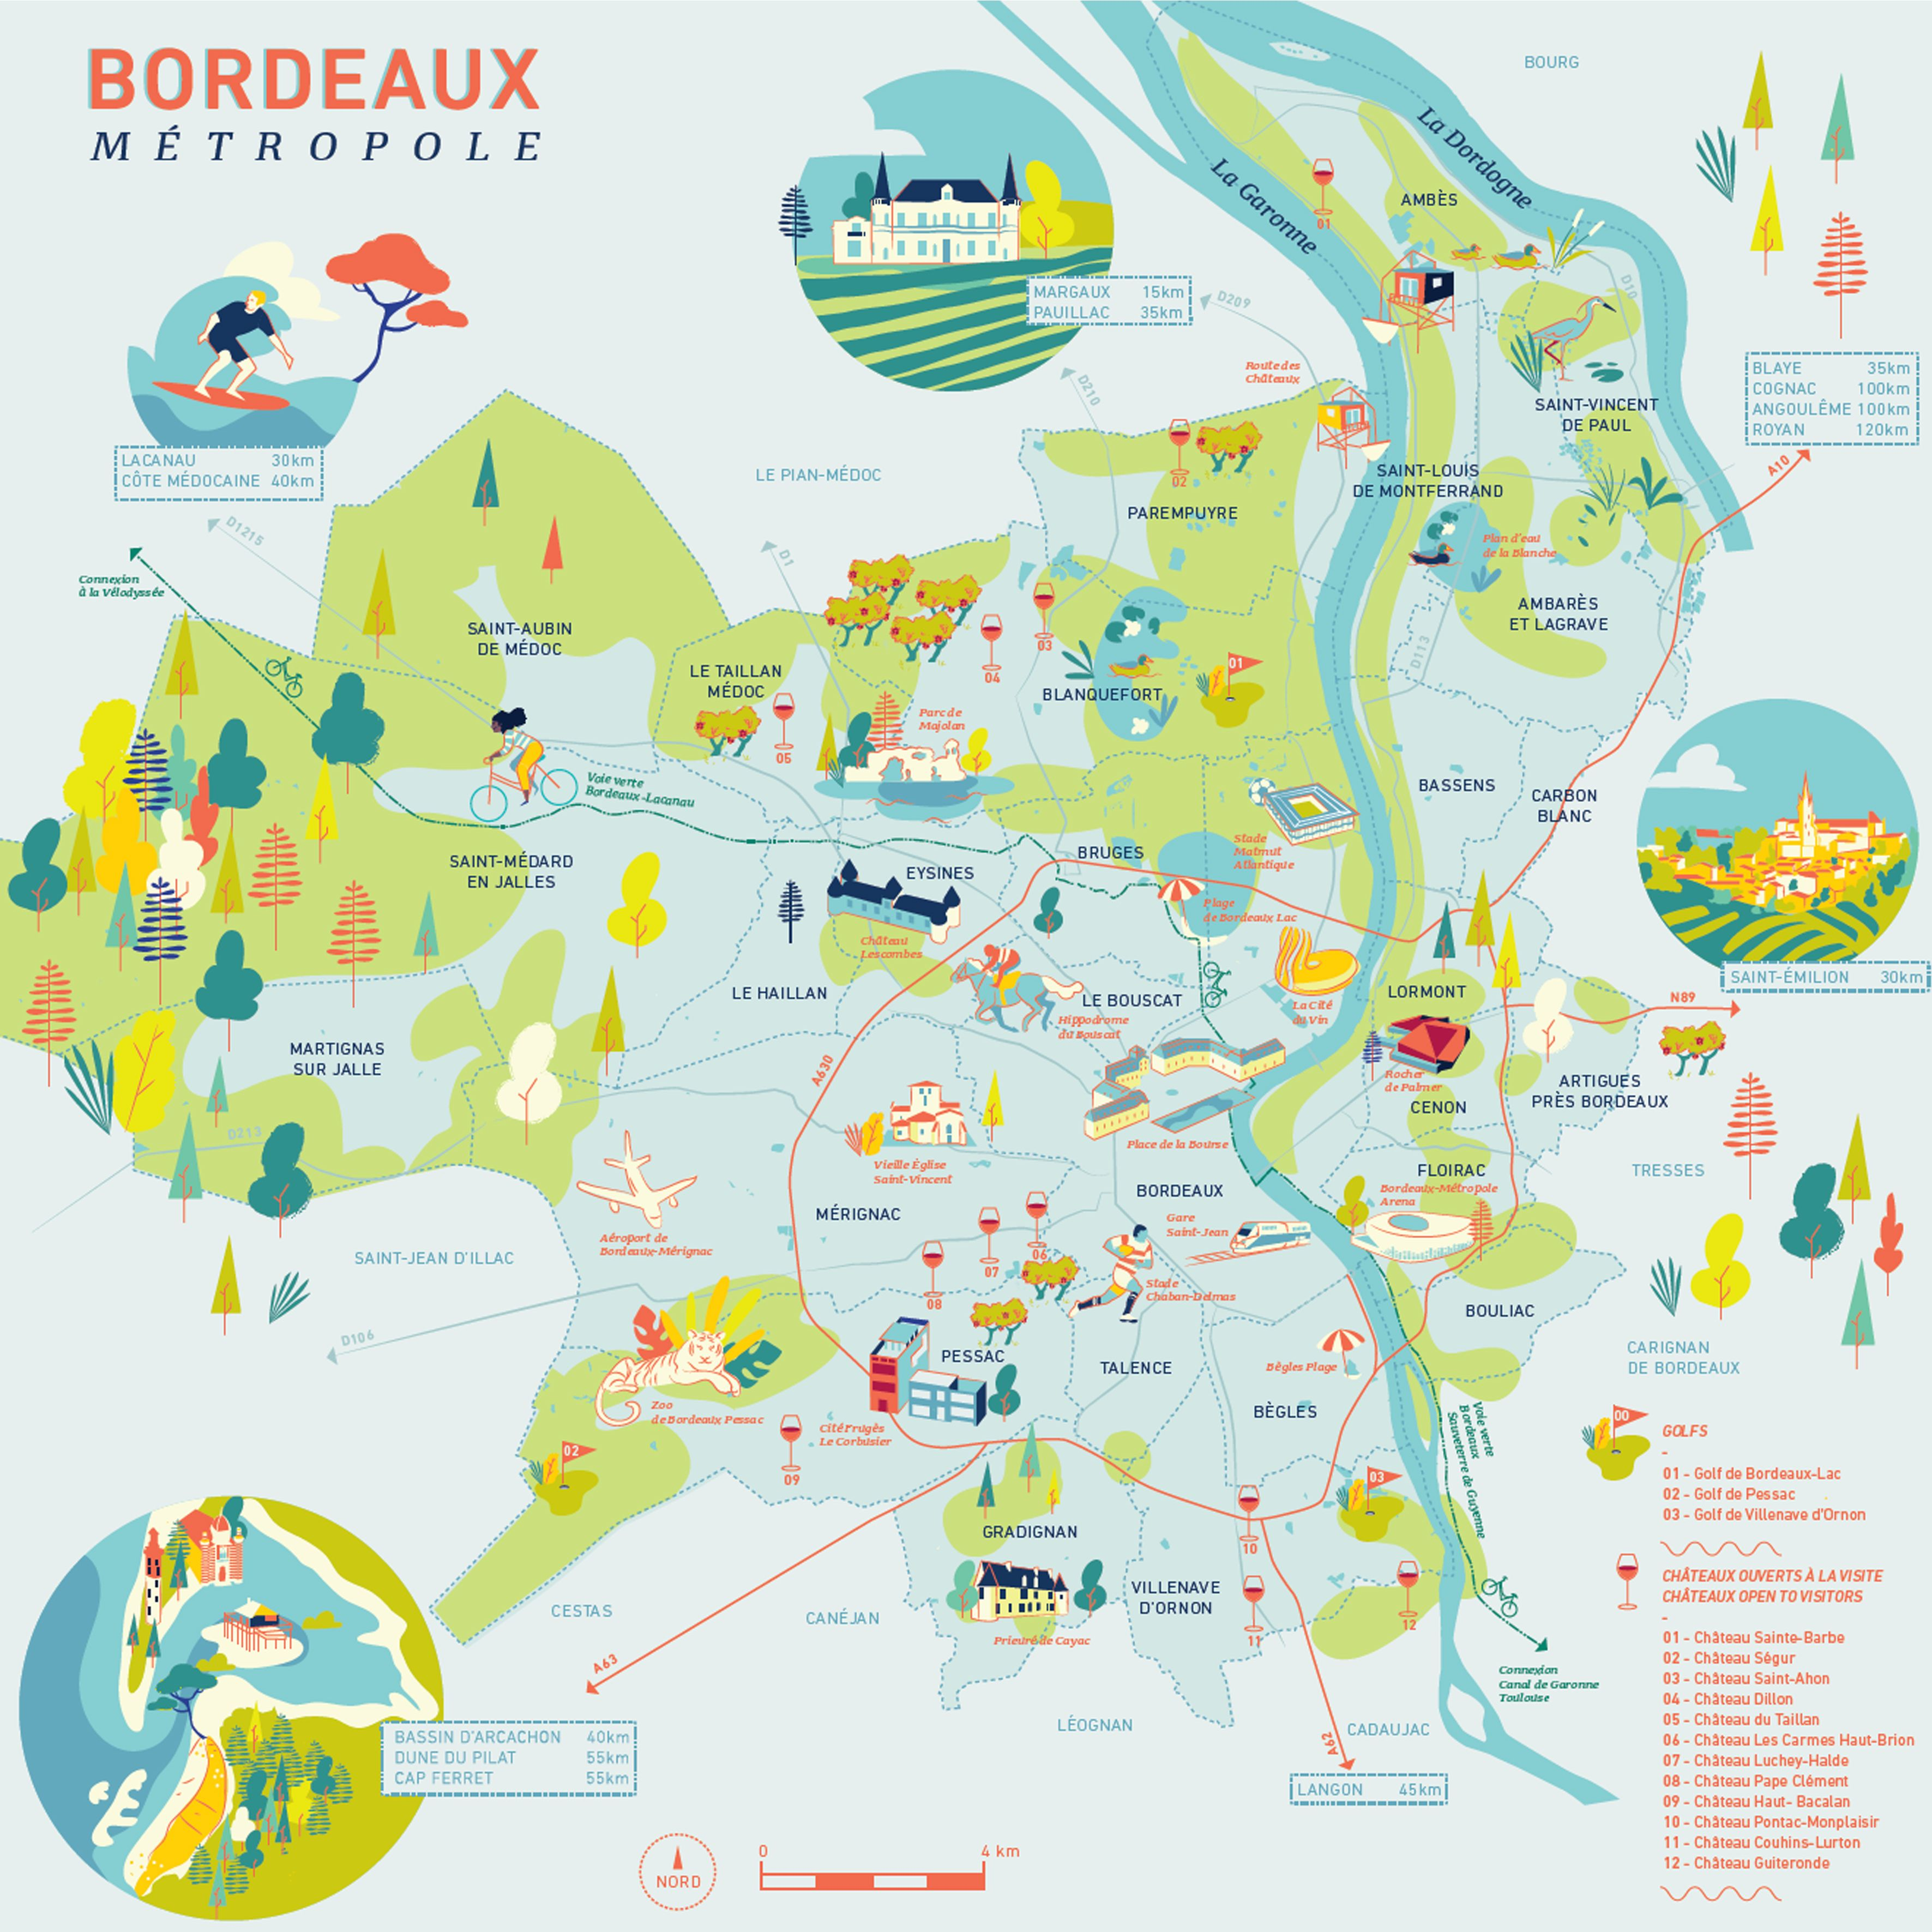 Mapa Turistico De Toulouse.Carte Illustree De Bordeaux Metropole Tourisme Cartes Illustrees Bordeaux Tourisme Carte Touristique